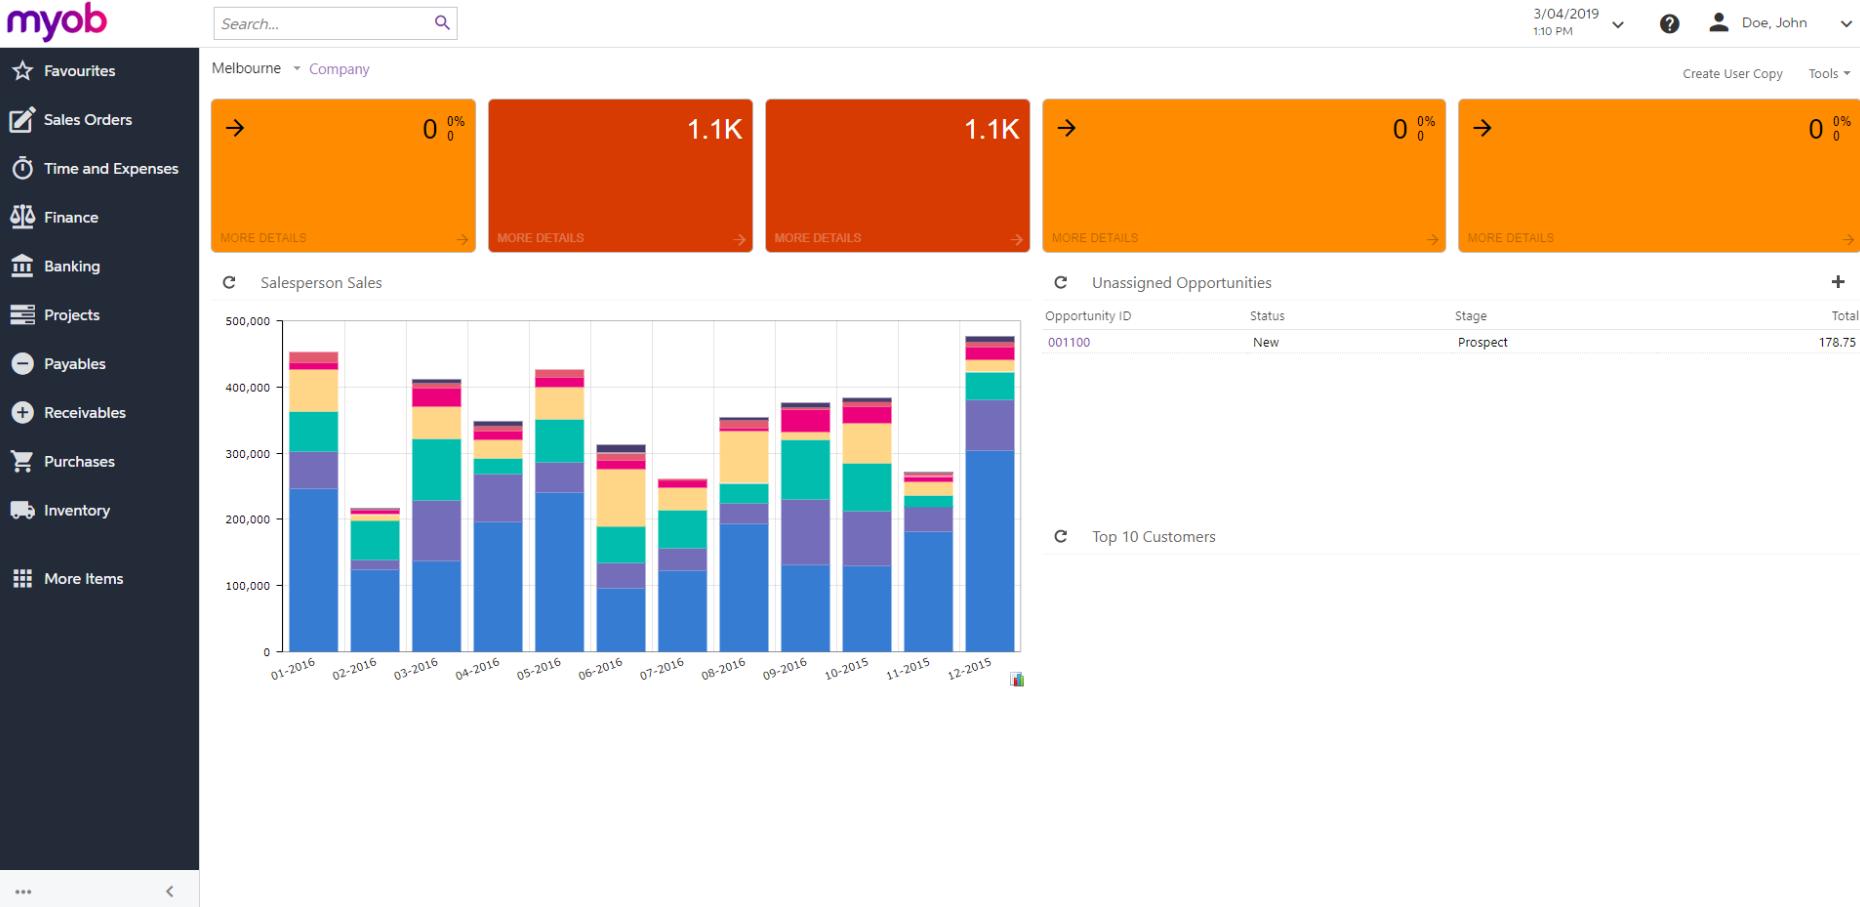 MYOB Advanced data visualization